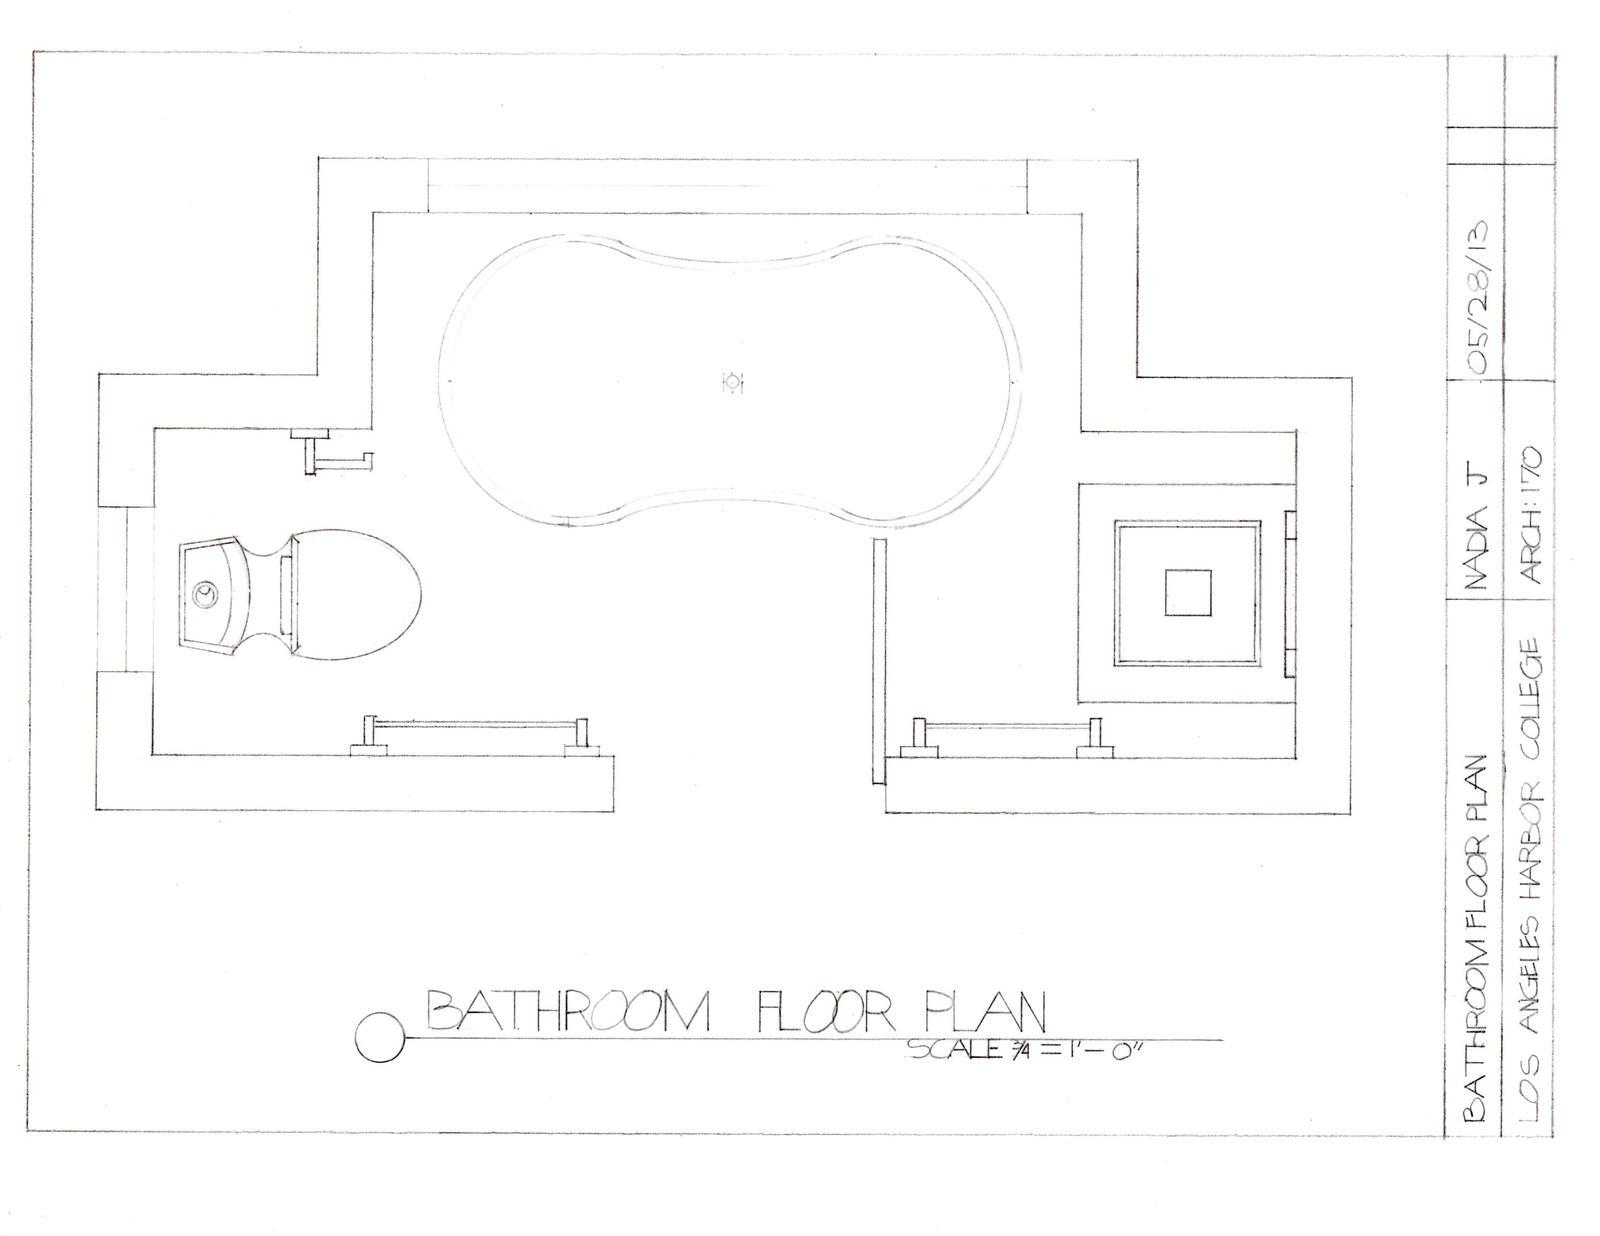 5 x 8 bathroom floor plan by tackygirl on deviantart for 4 x 8 bathroom layout